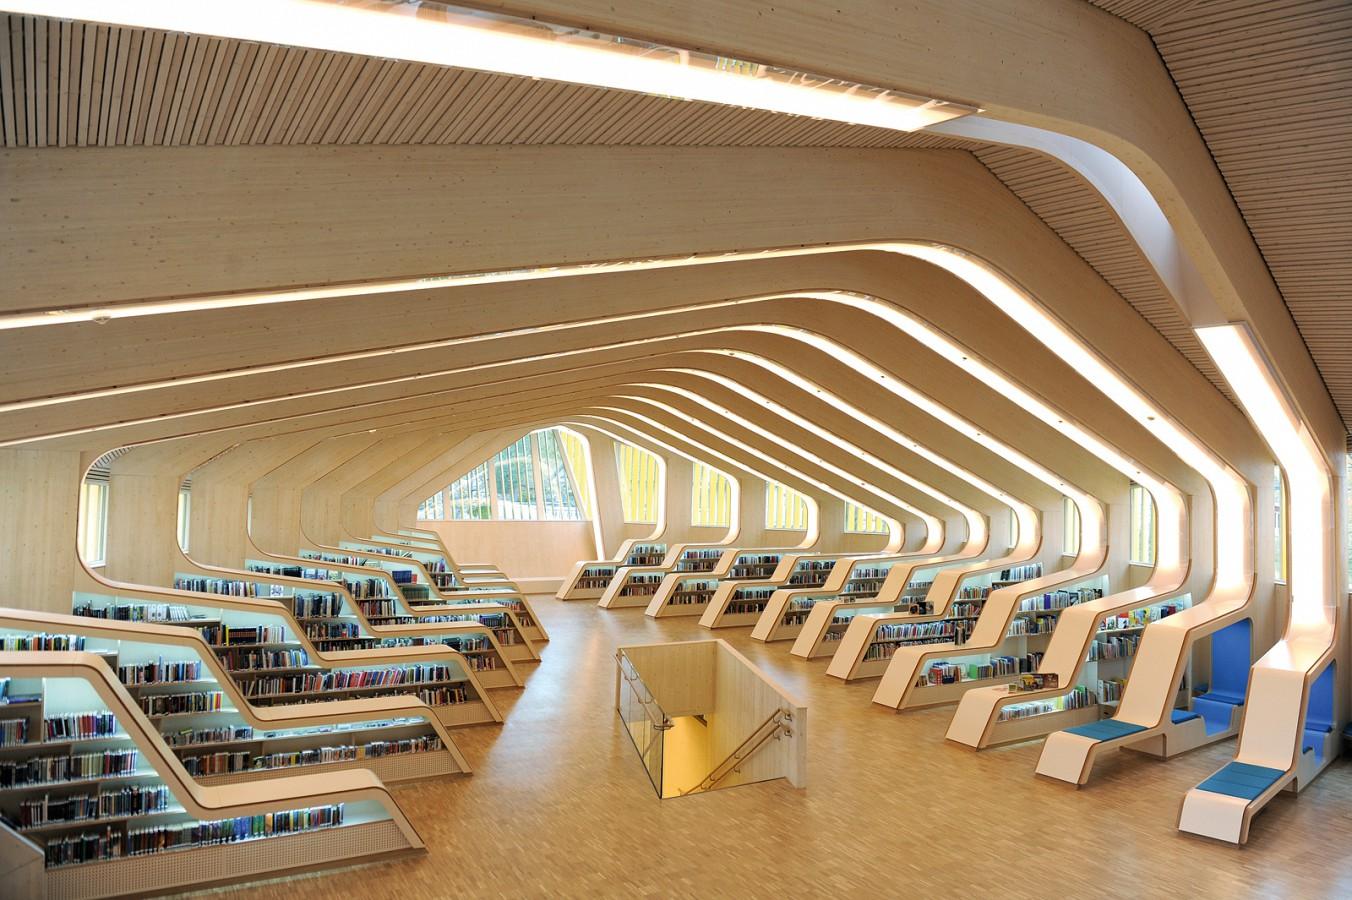 Vennesla Library and Culture House Vennesla Norway